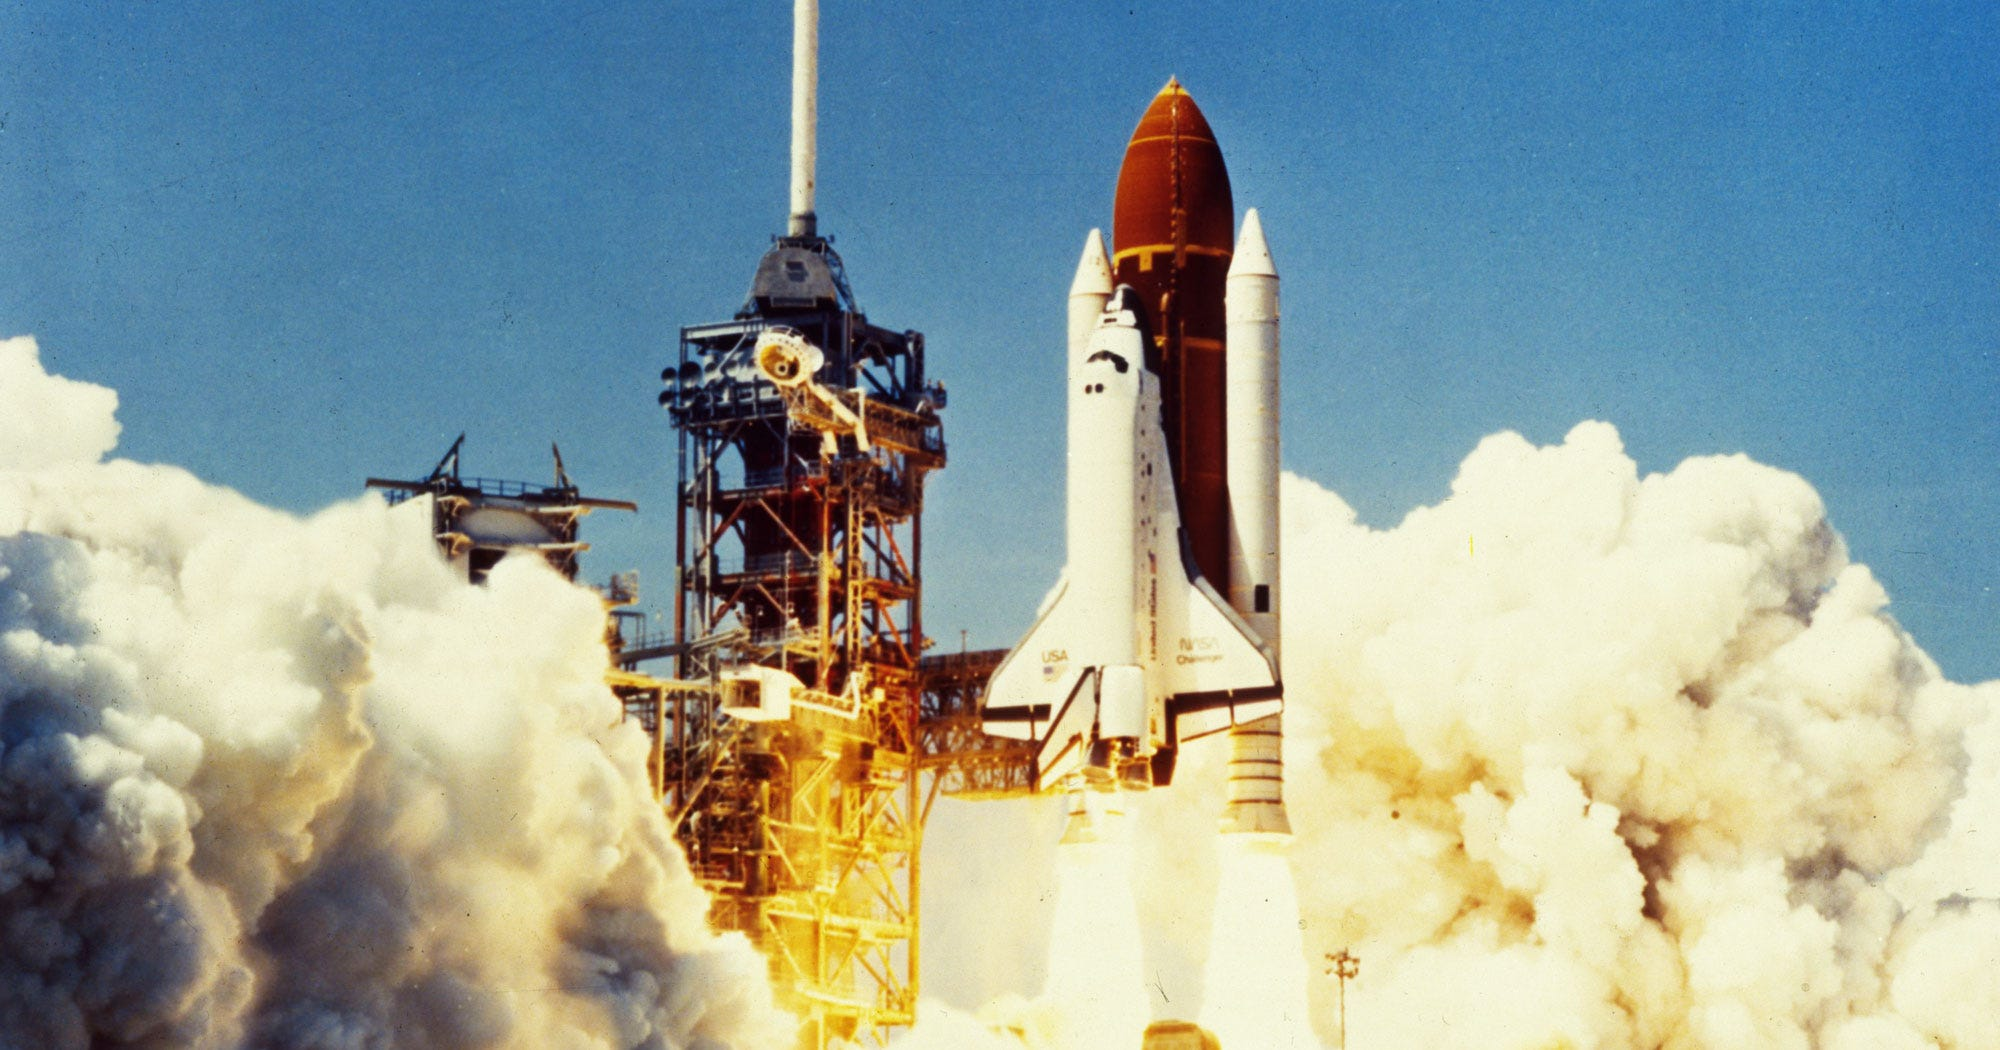 NASA Challenger Explosion 30 Year Anniversary